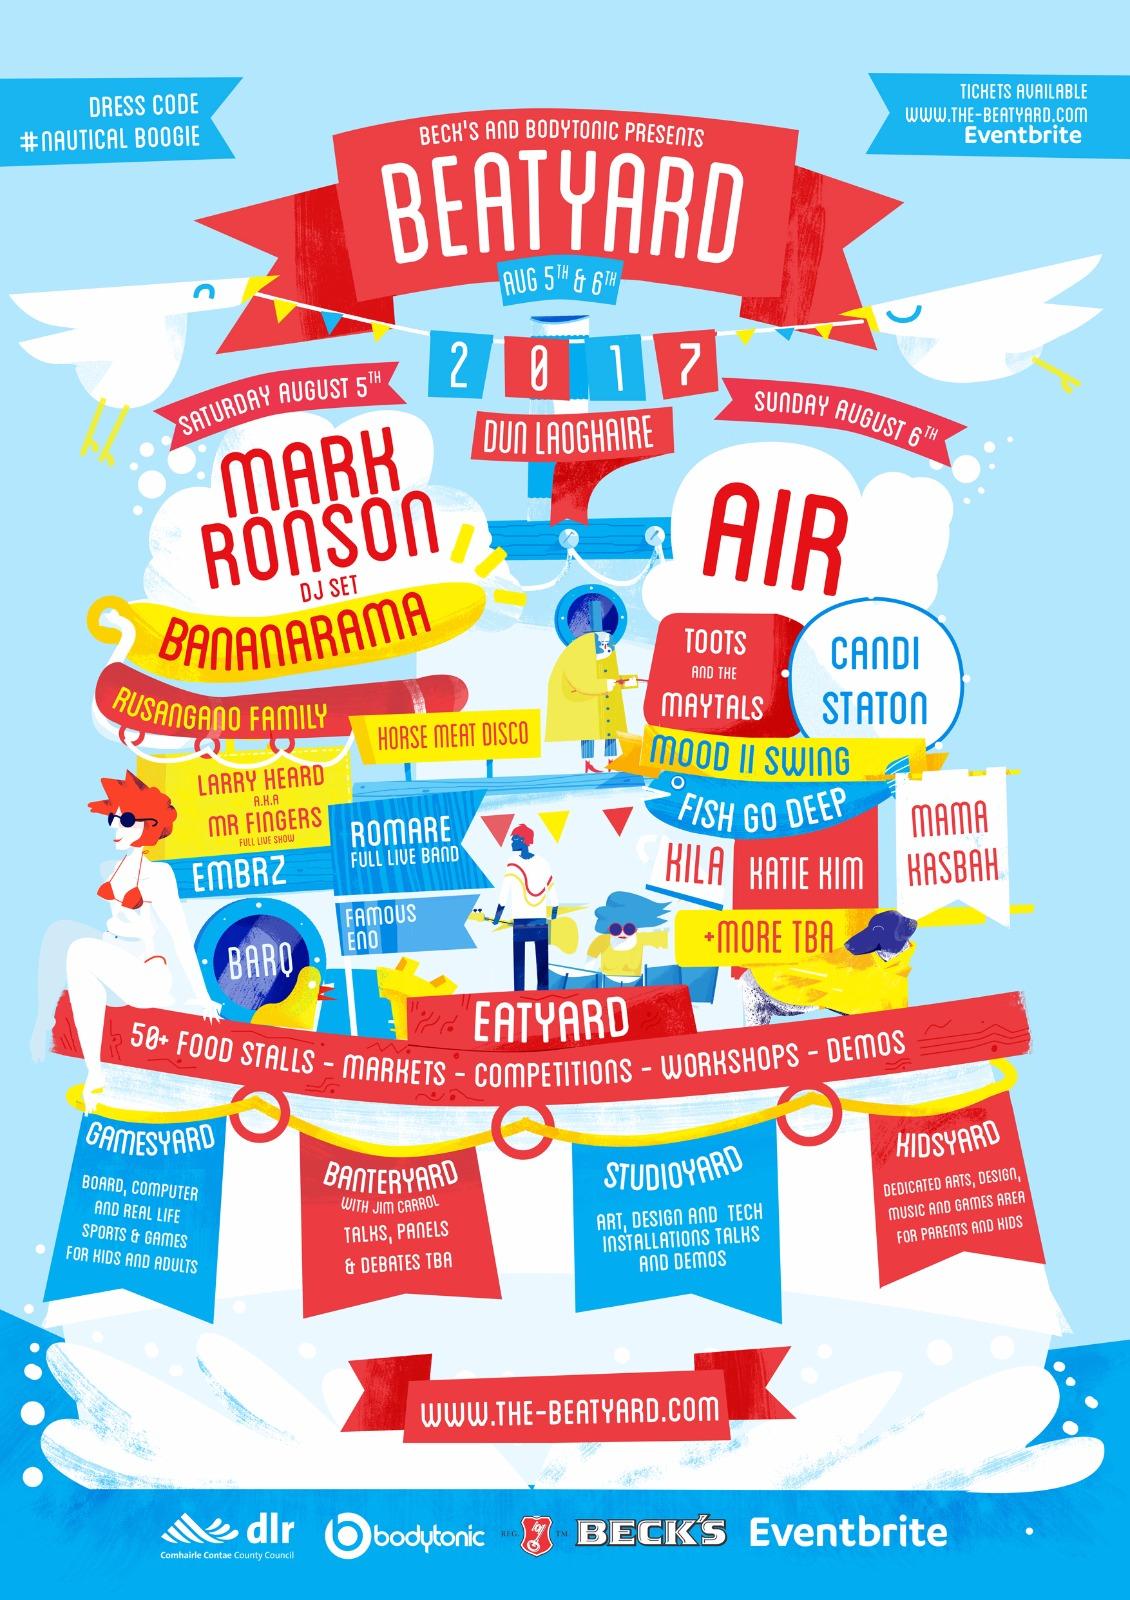 Beatyard2017 _lineup_poster